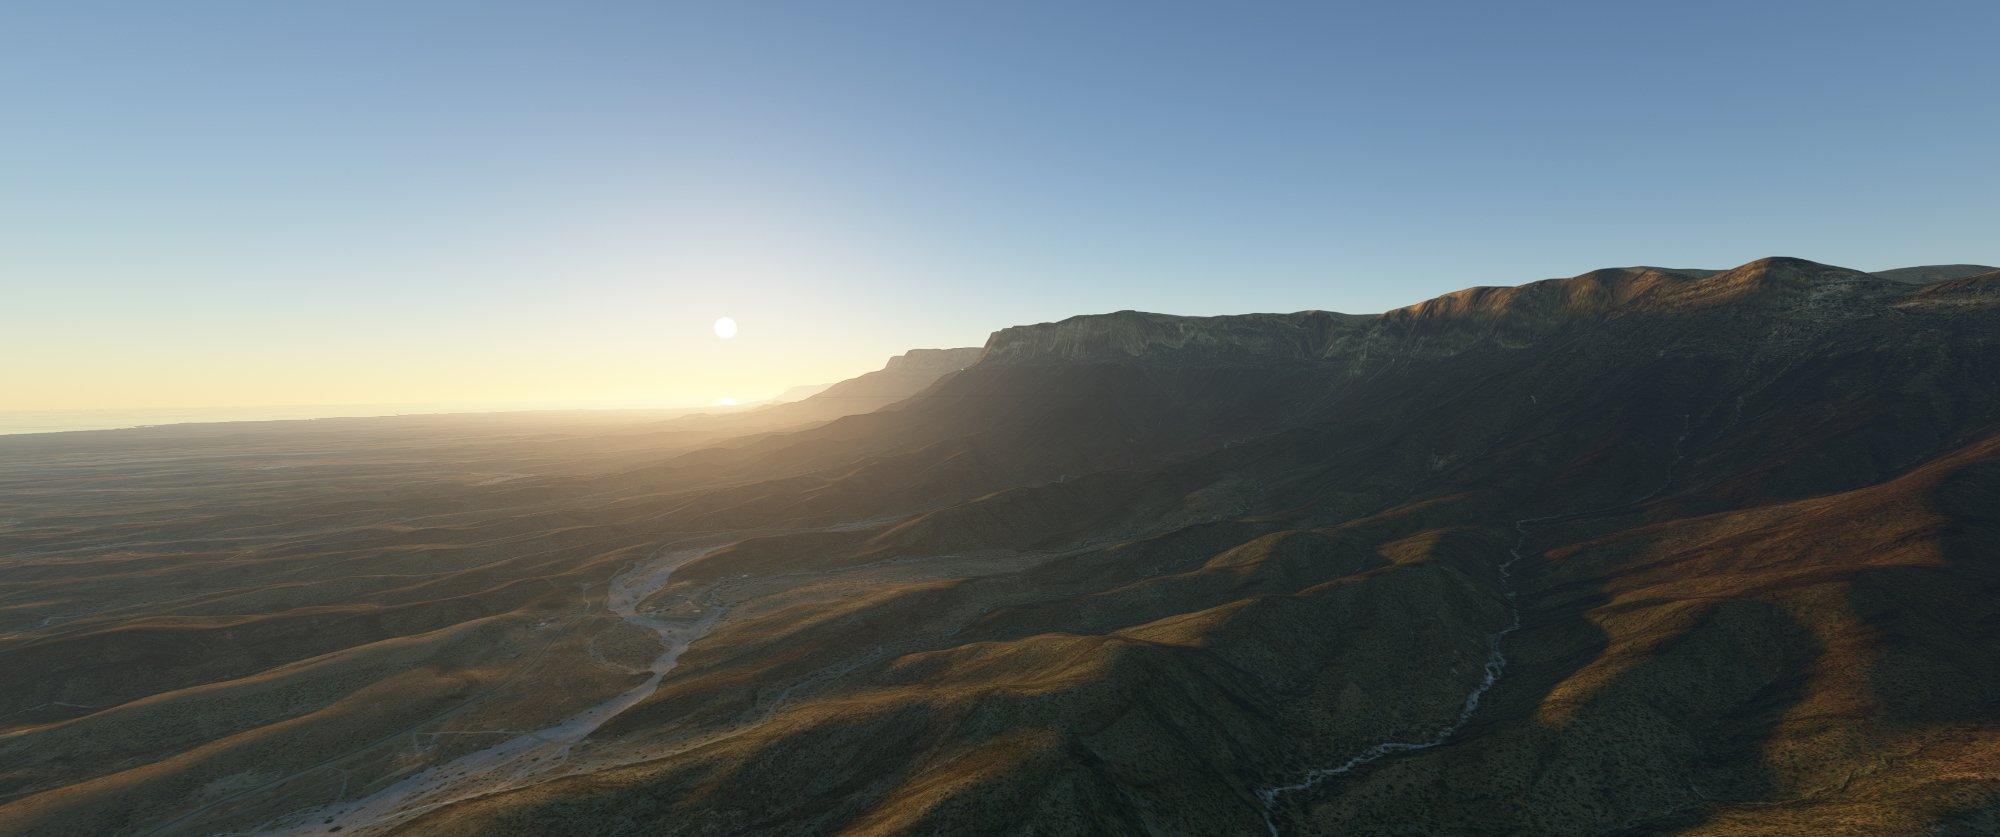 Microsoft Flight Simulator Screenshot 2020.12.18 - 14.26.28.16.jpg